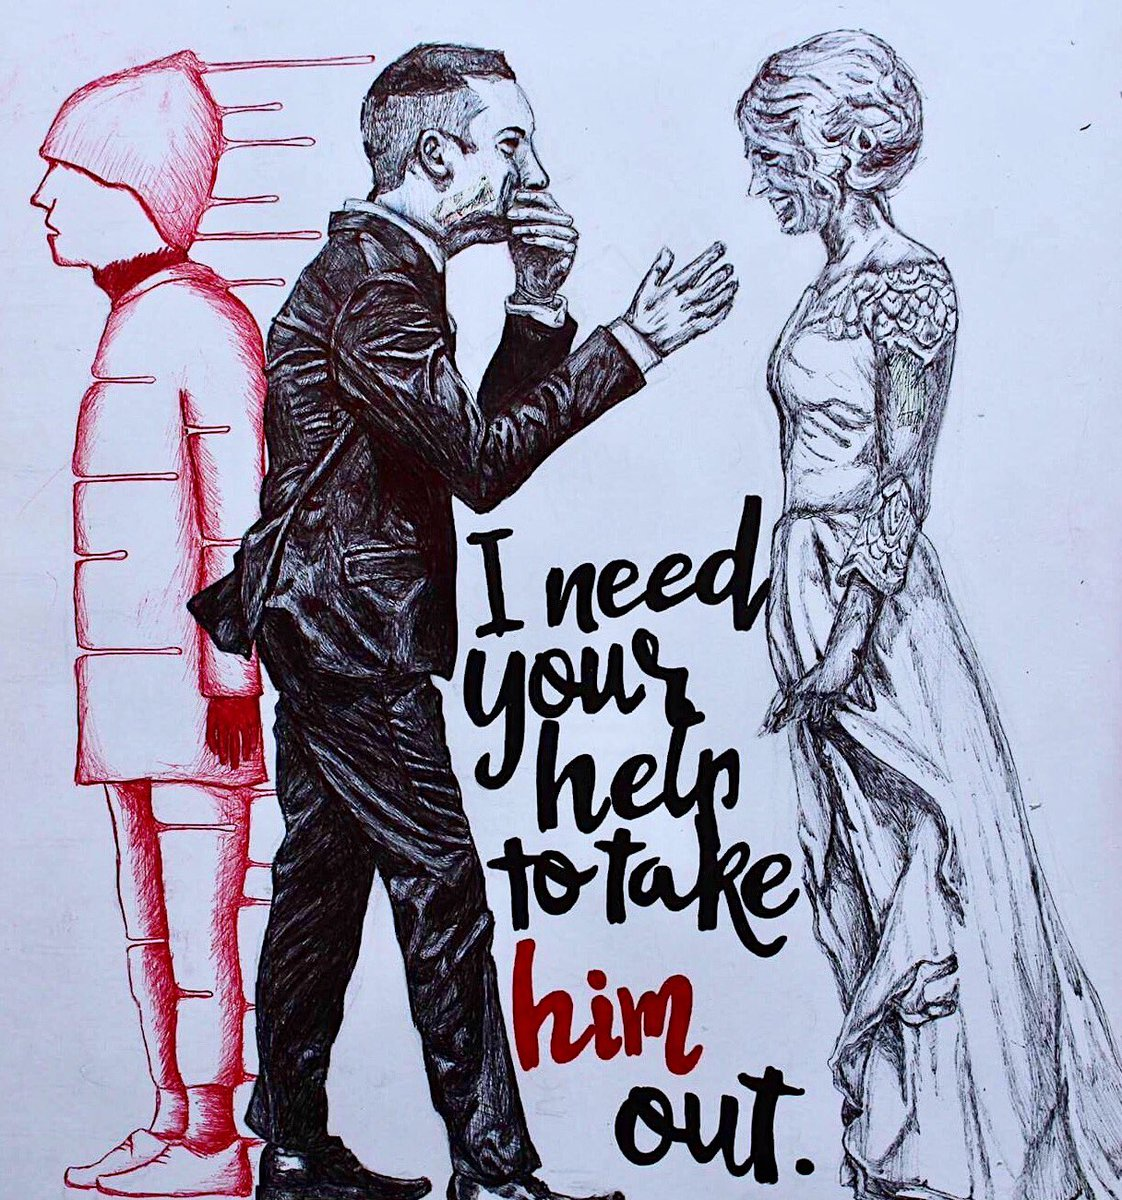 .: i need your help to take him out :.   #cliqueart #FanArtFriday @tylerrjoseph @thedavidthedad @jennaajoseph @twentyonepilots<br>http://pic.twitter.com/4LwVLvTrha